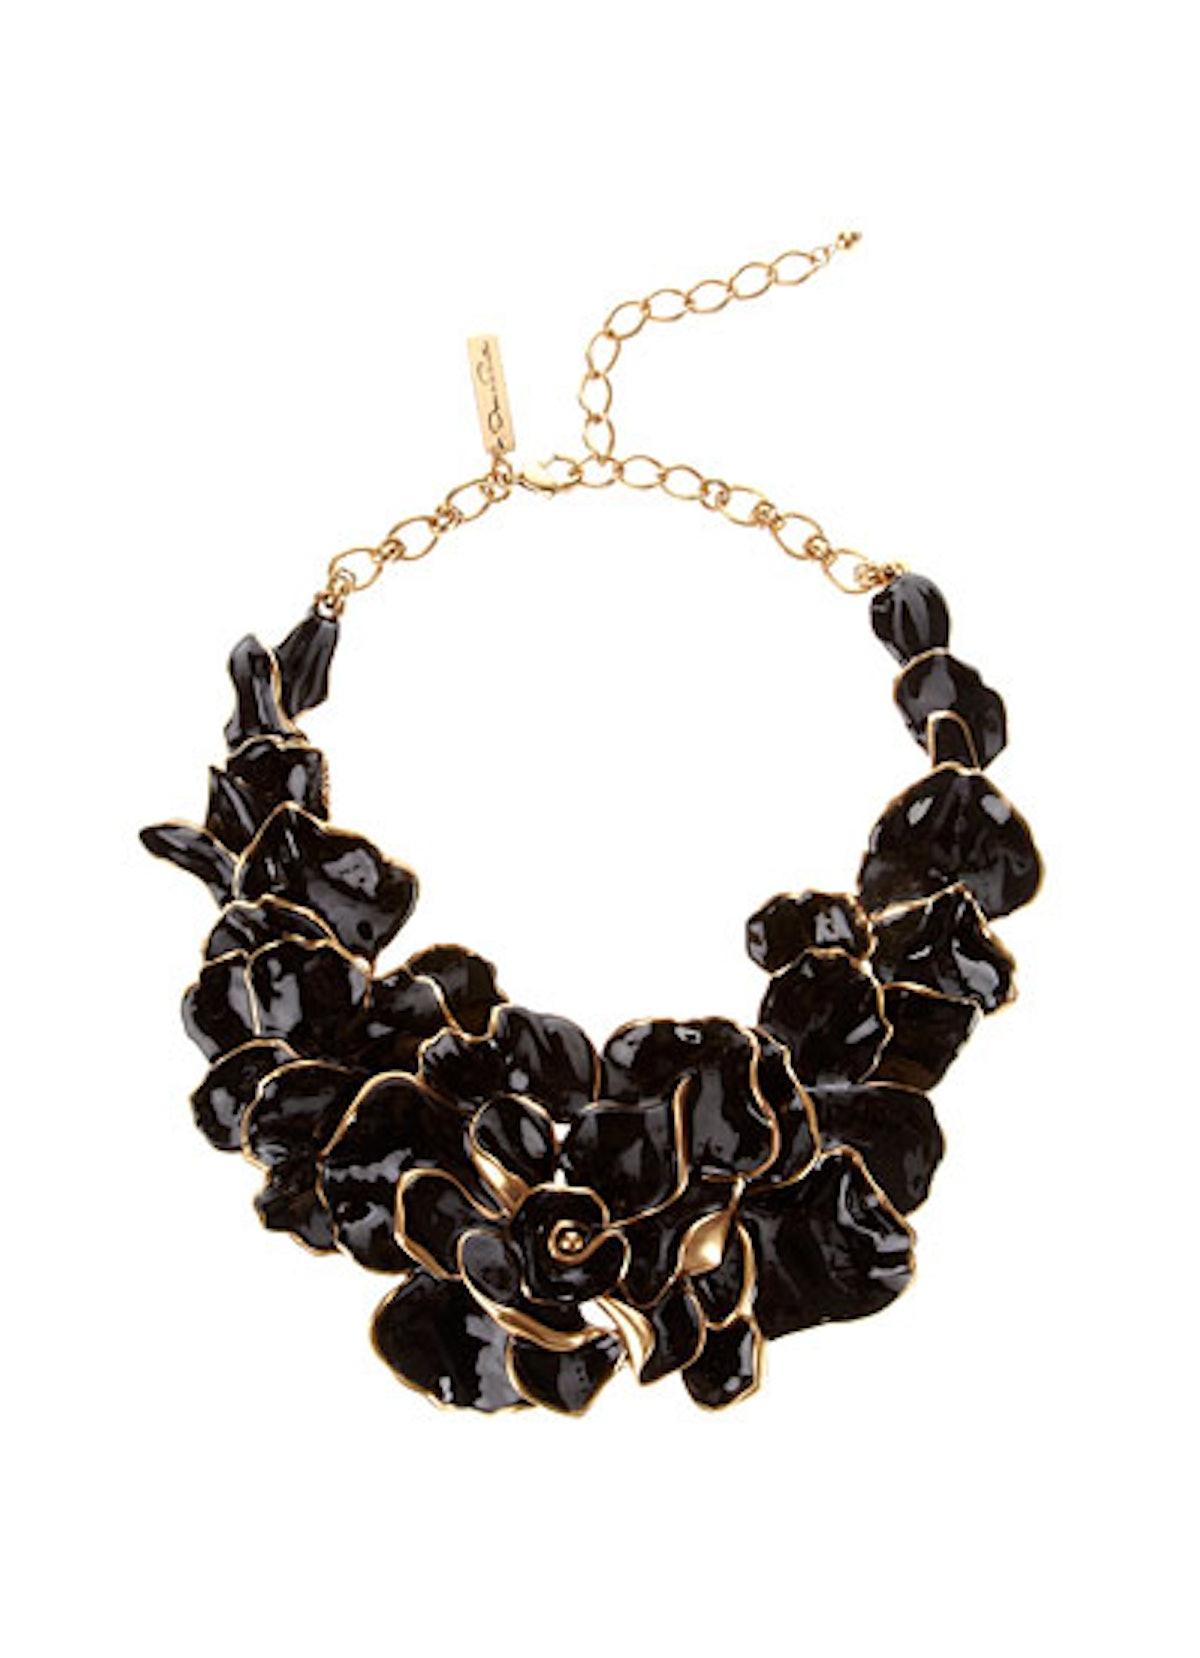 acss-decades-costume-jewelry-22-v.jpg